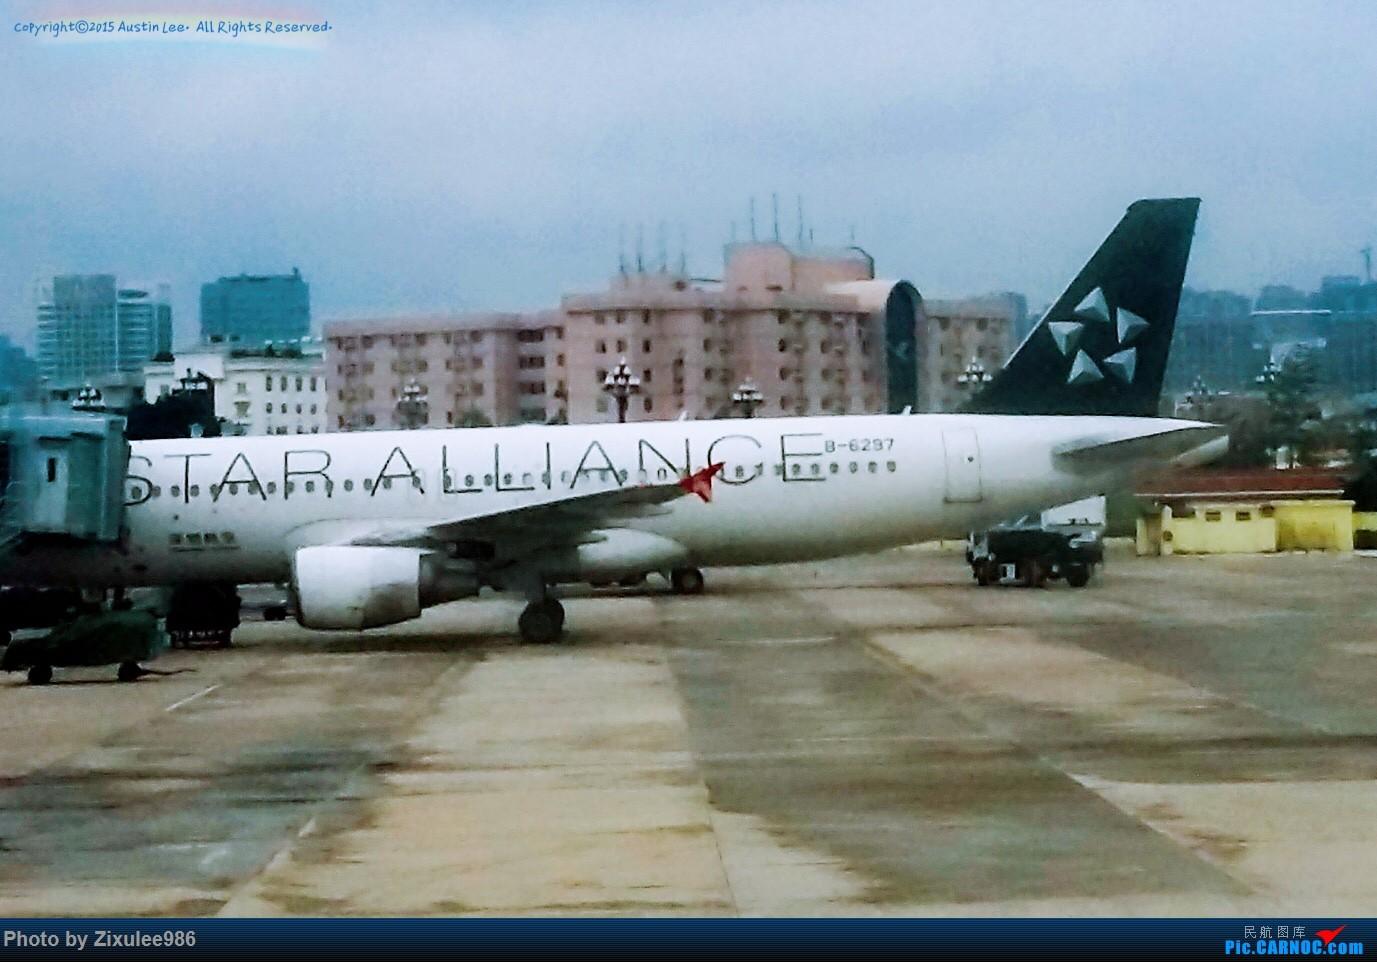 Re:[原创]三年旅途的随拍精选~持续不定时update AIRBUS A320-214 B-6297 中国泉州晋江国际机场